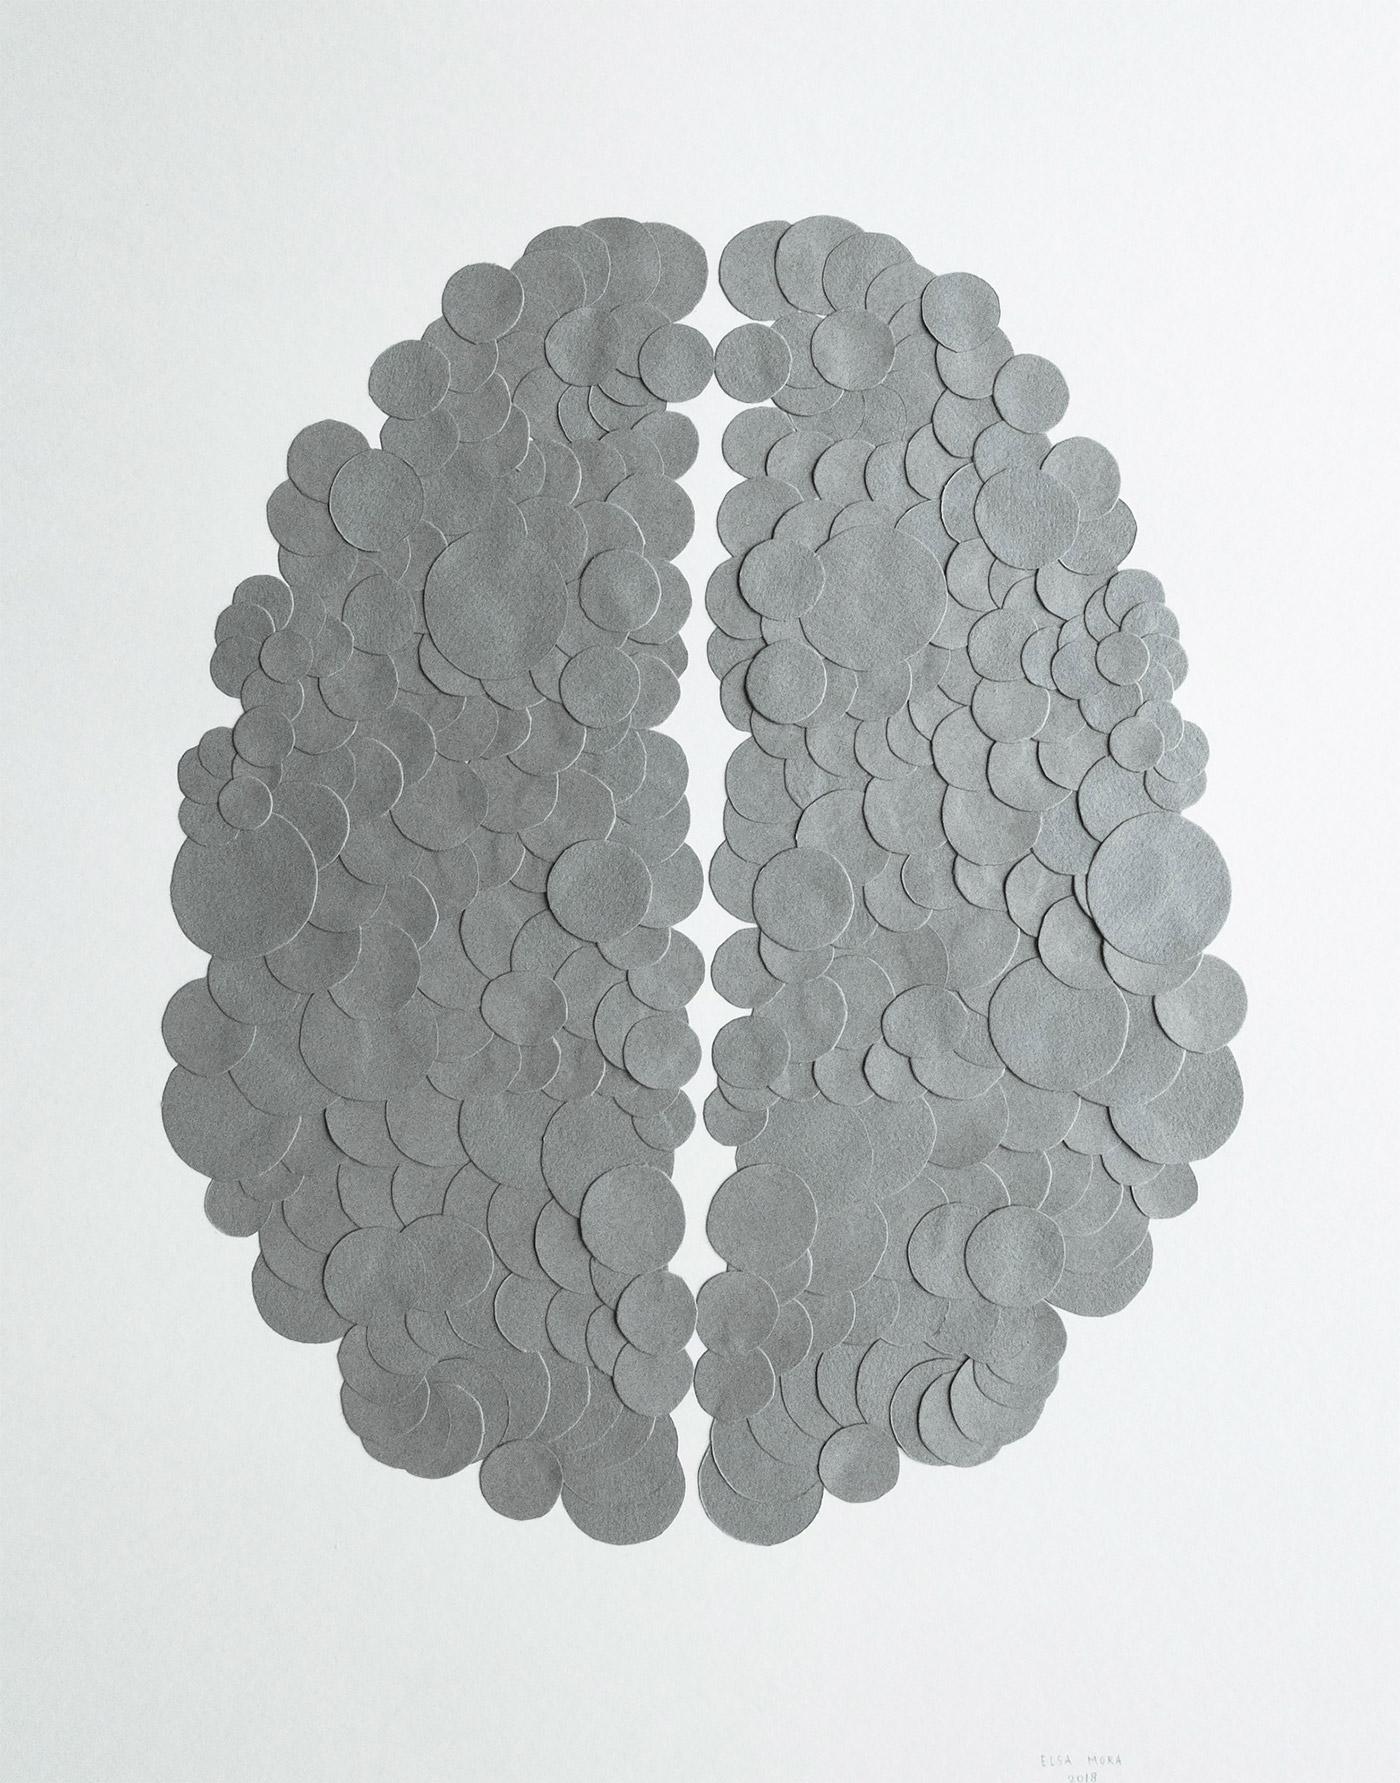 art-paper-elsa-mora-16.jpg